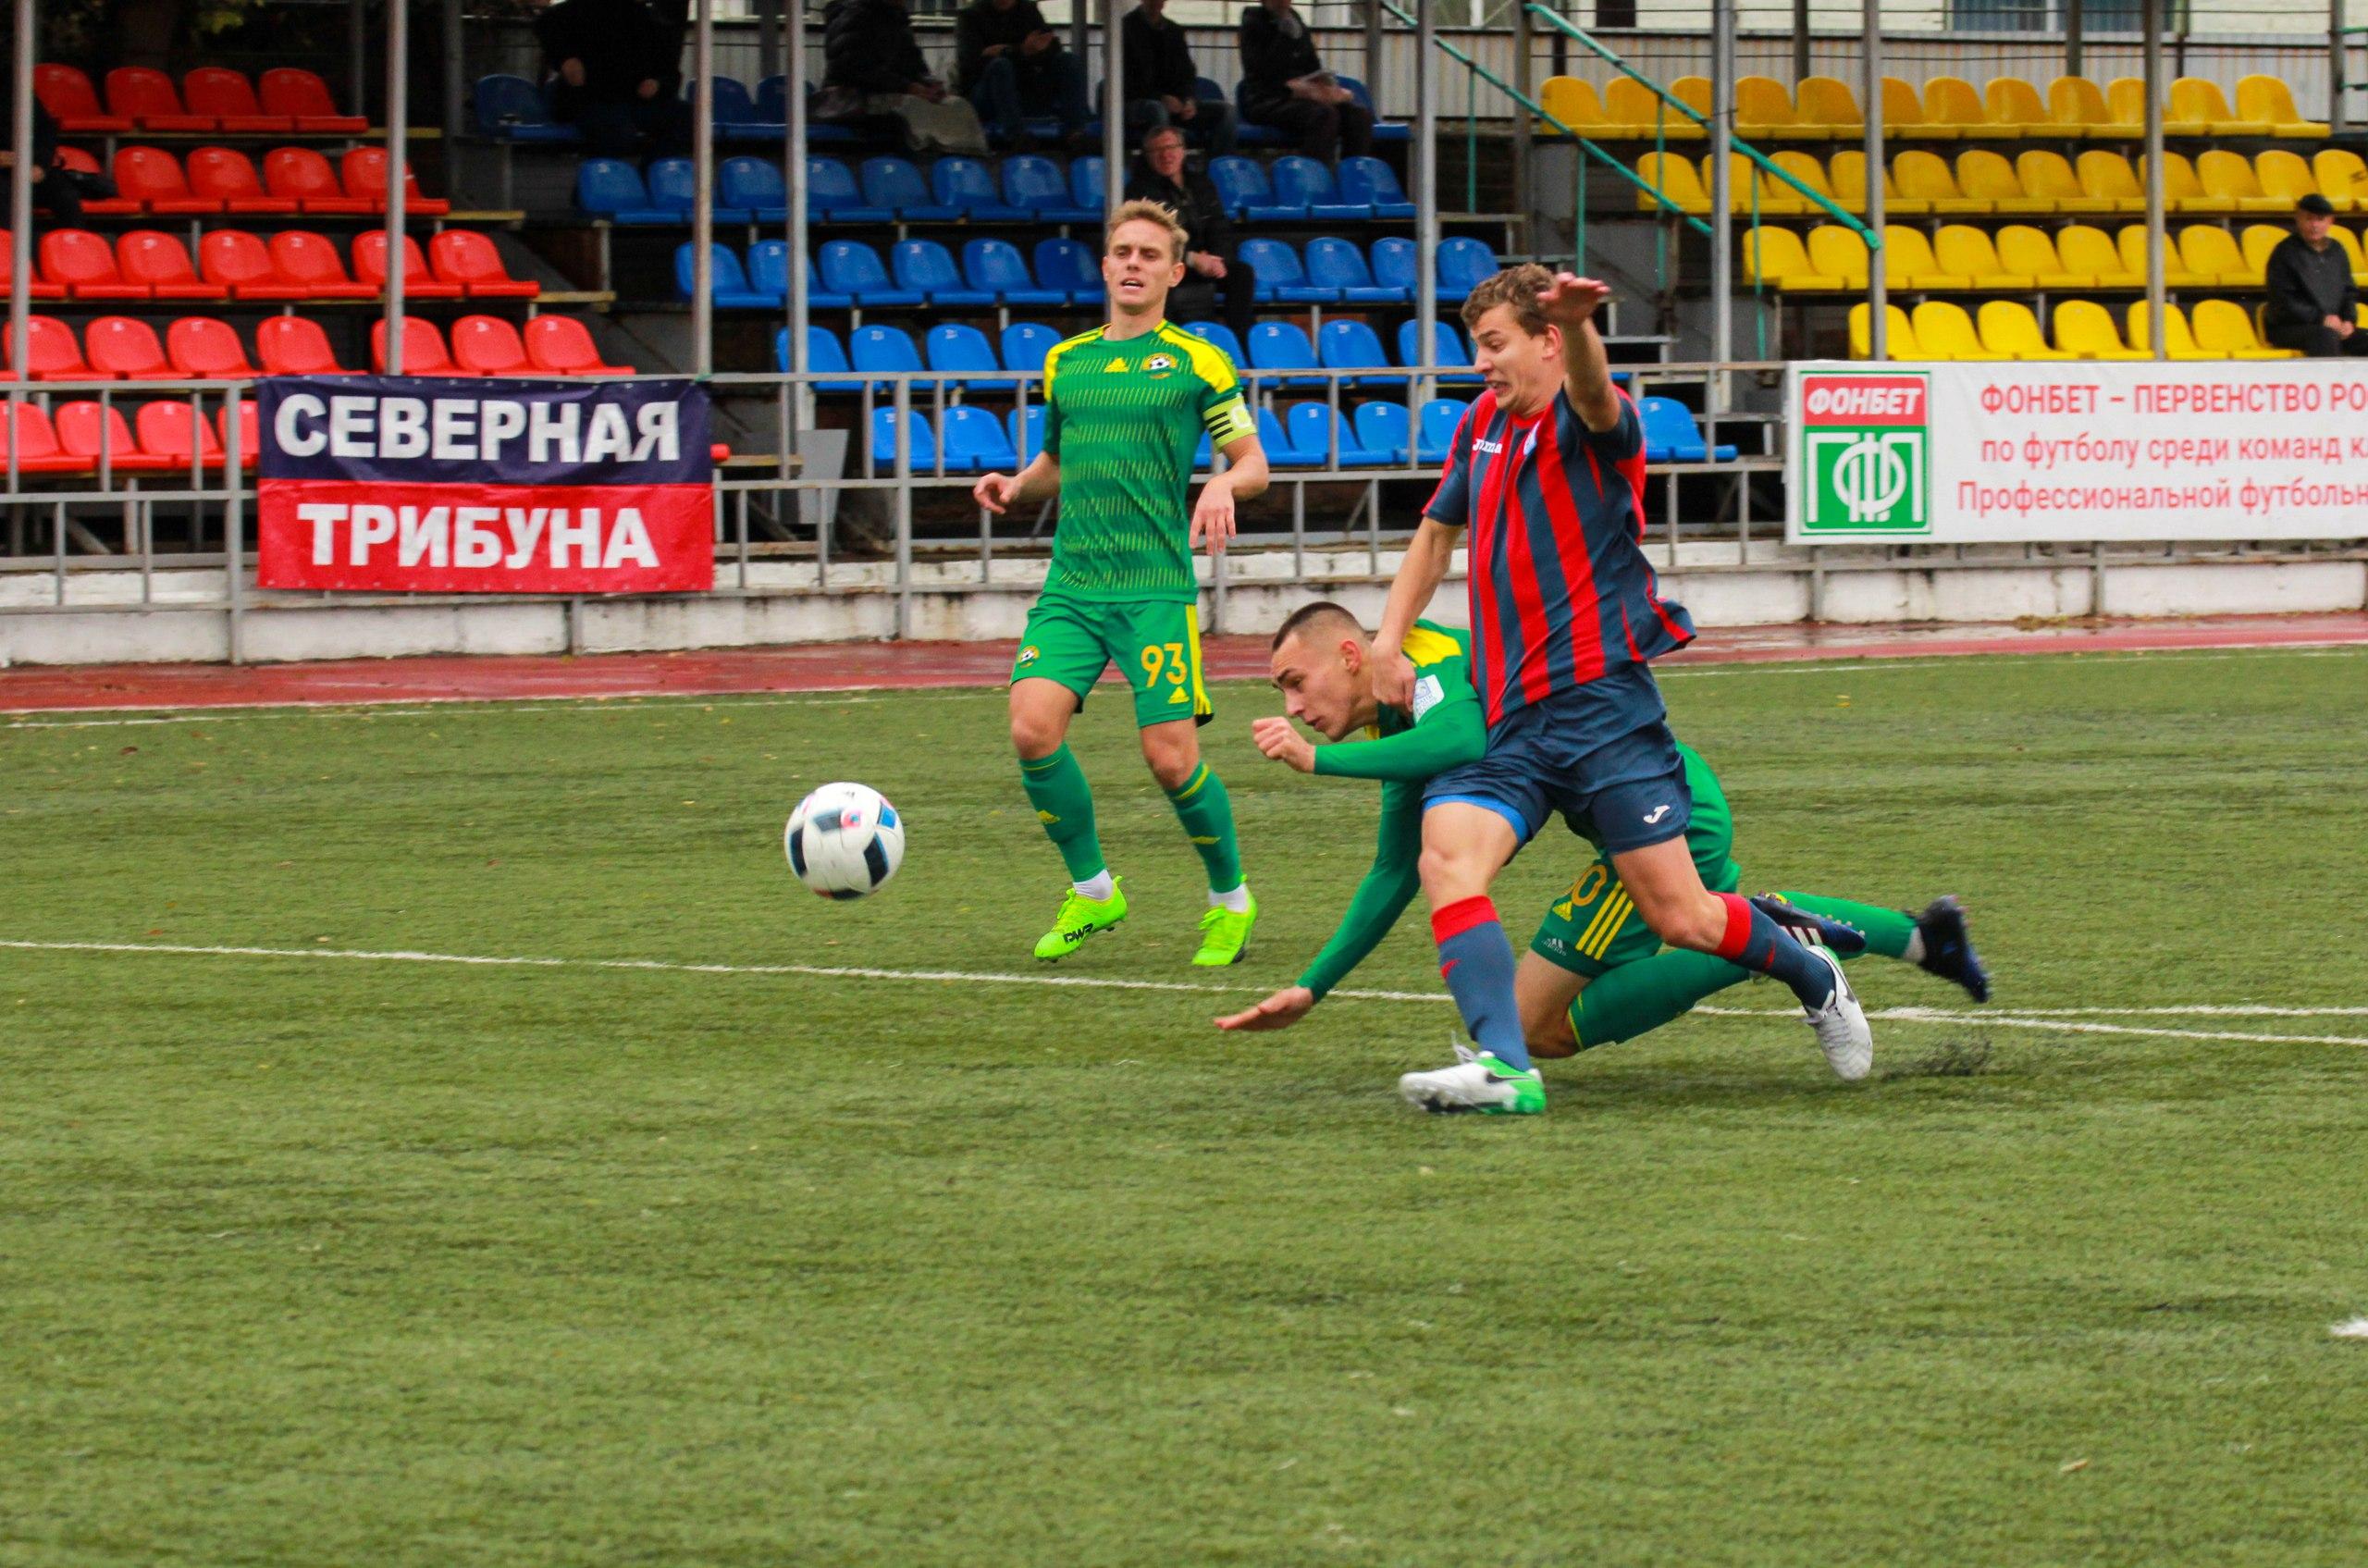 Прогноз на матч Академия - Динамо Ставрополь